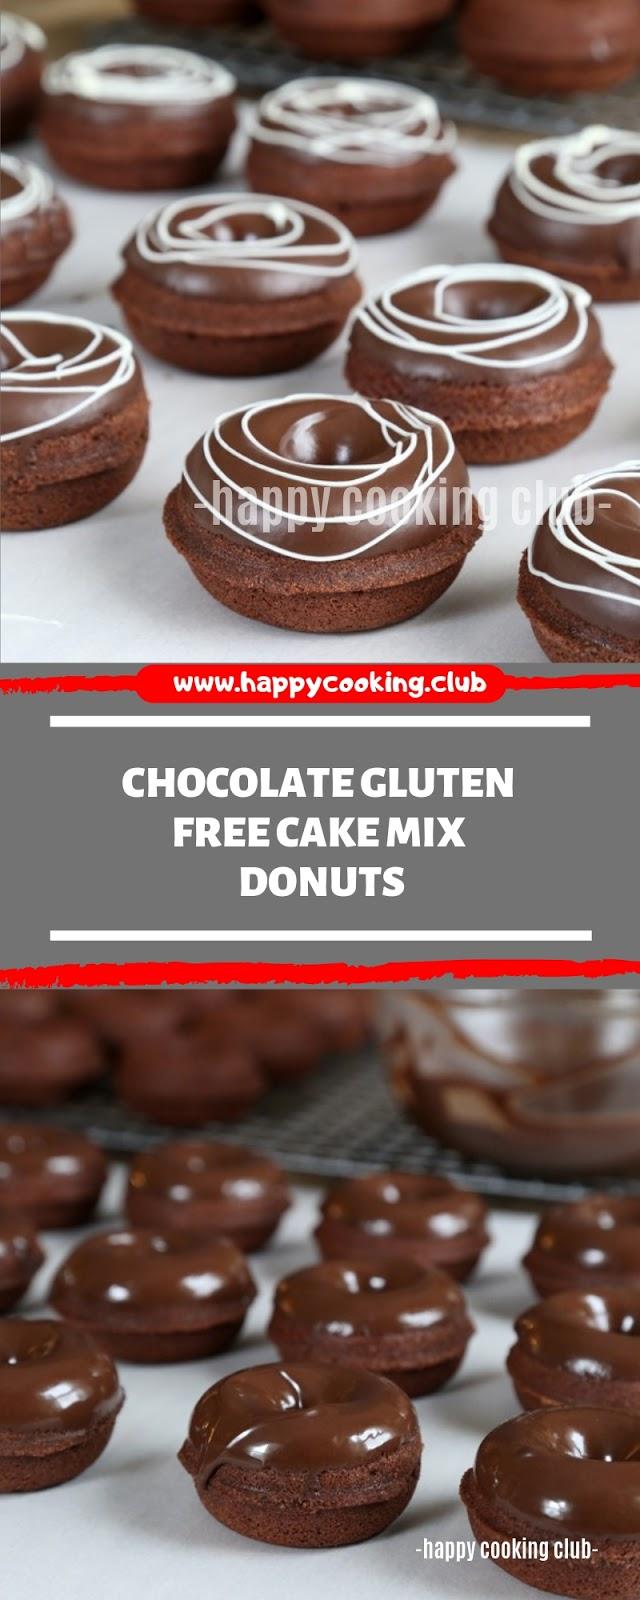 Chocolate Gluten Free Cake Mix Donuts